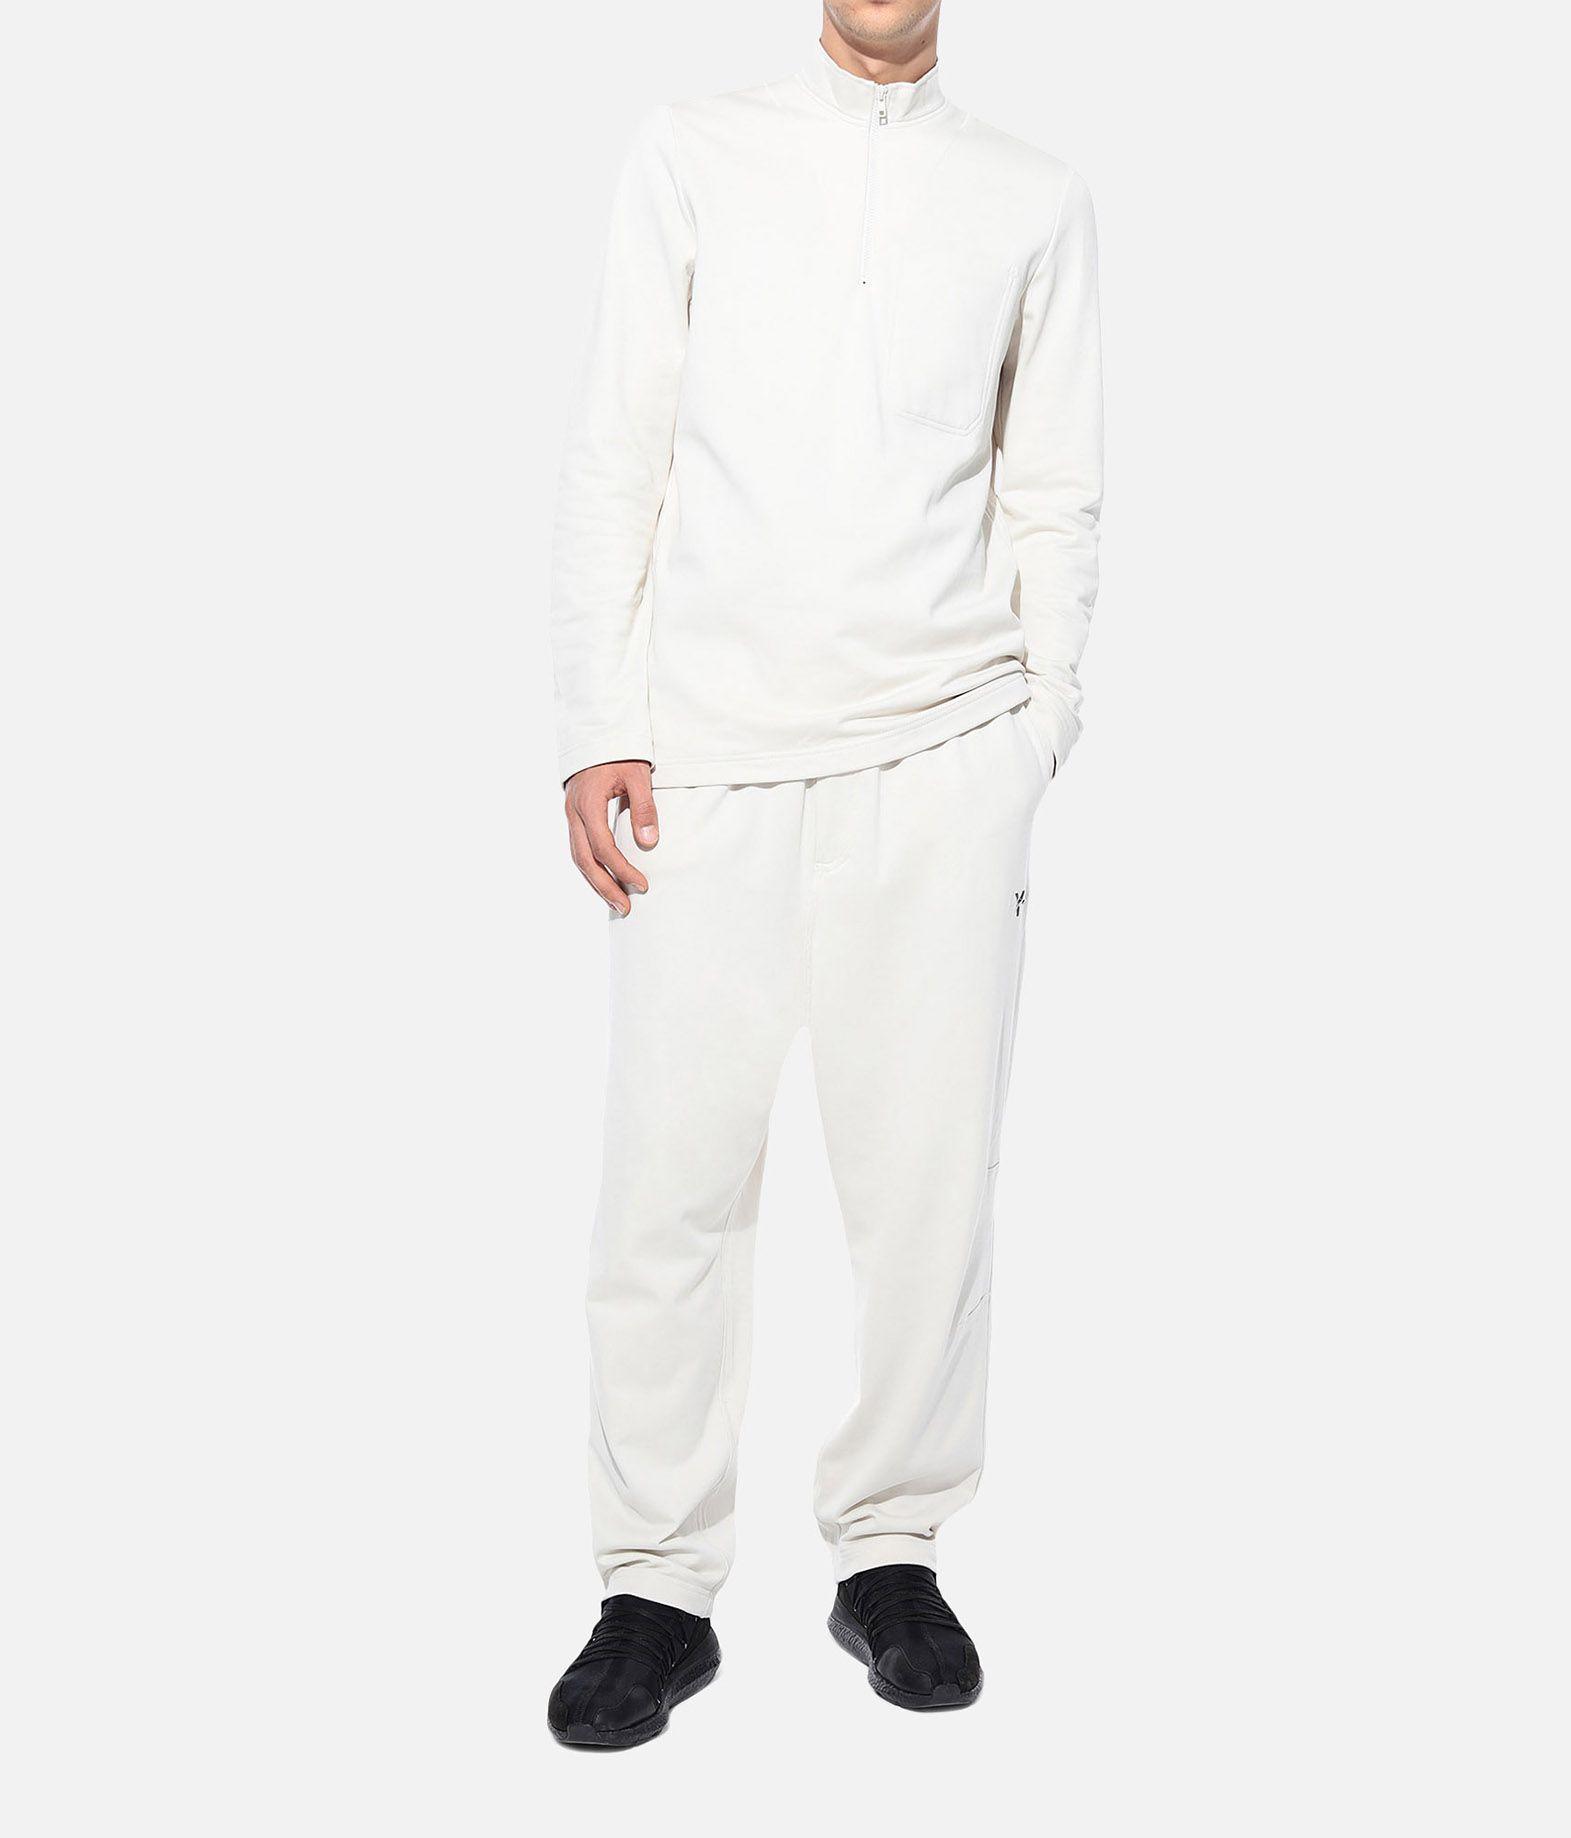 Y-3 Y-3 Sashiko Sweater Толстовка на молнии Для Мужчин a